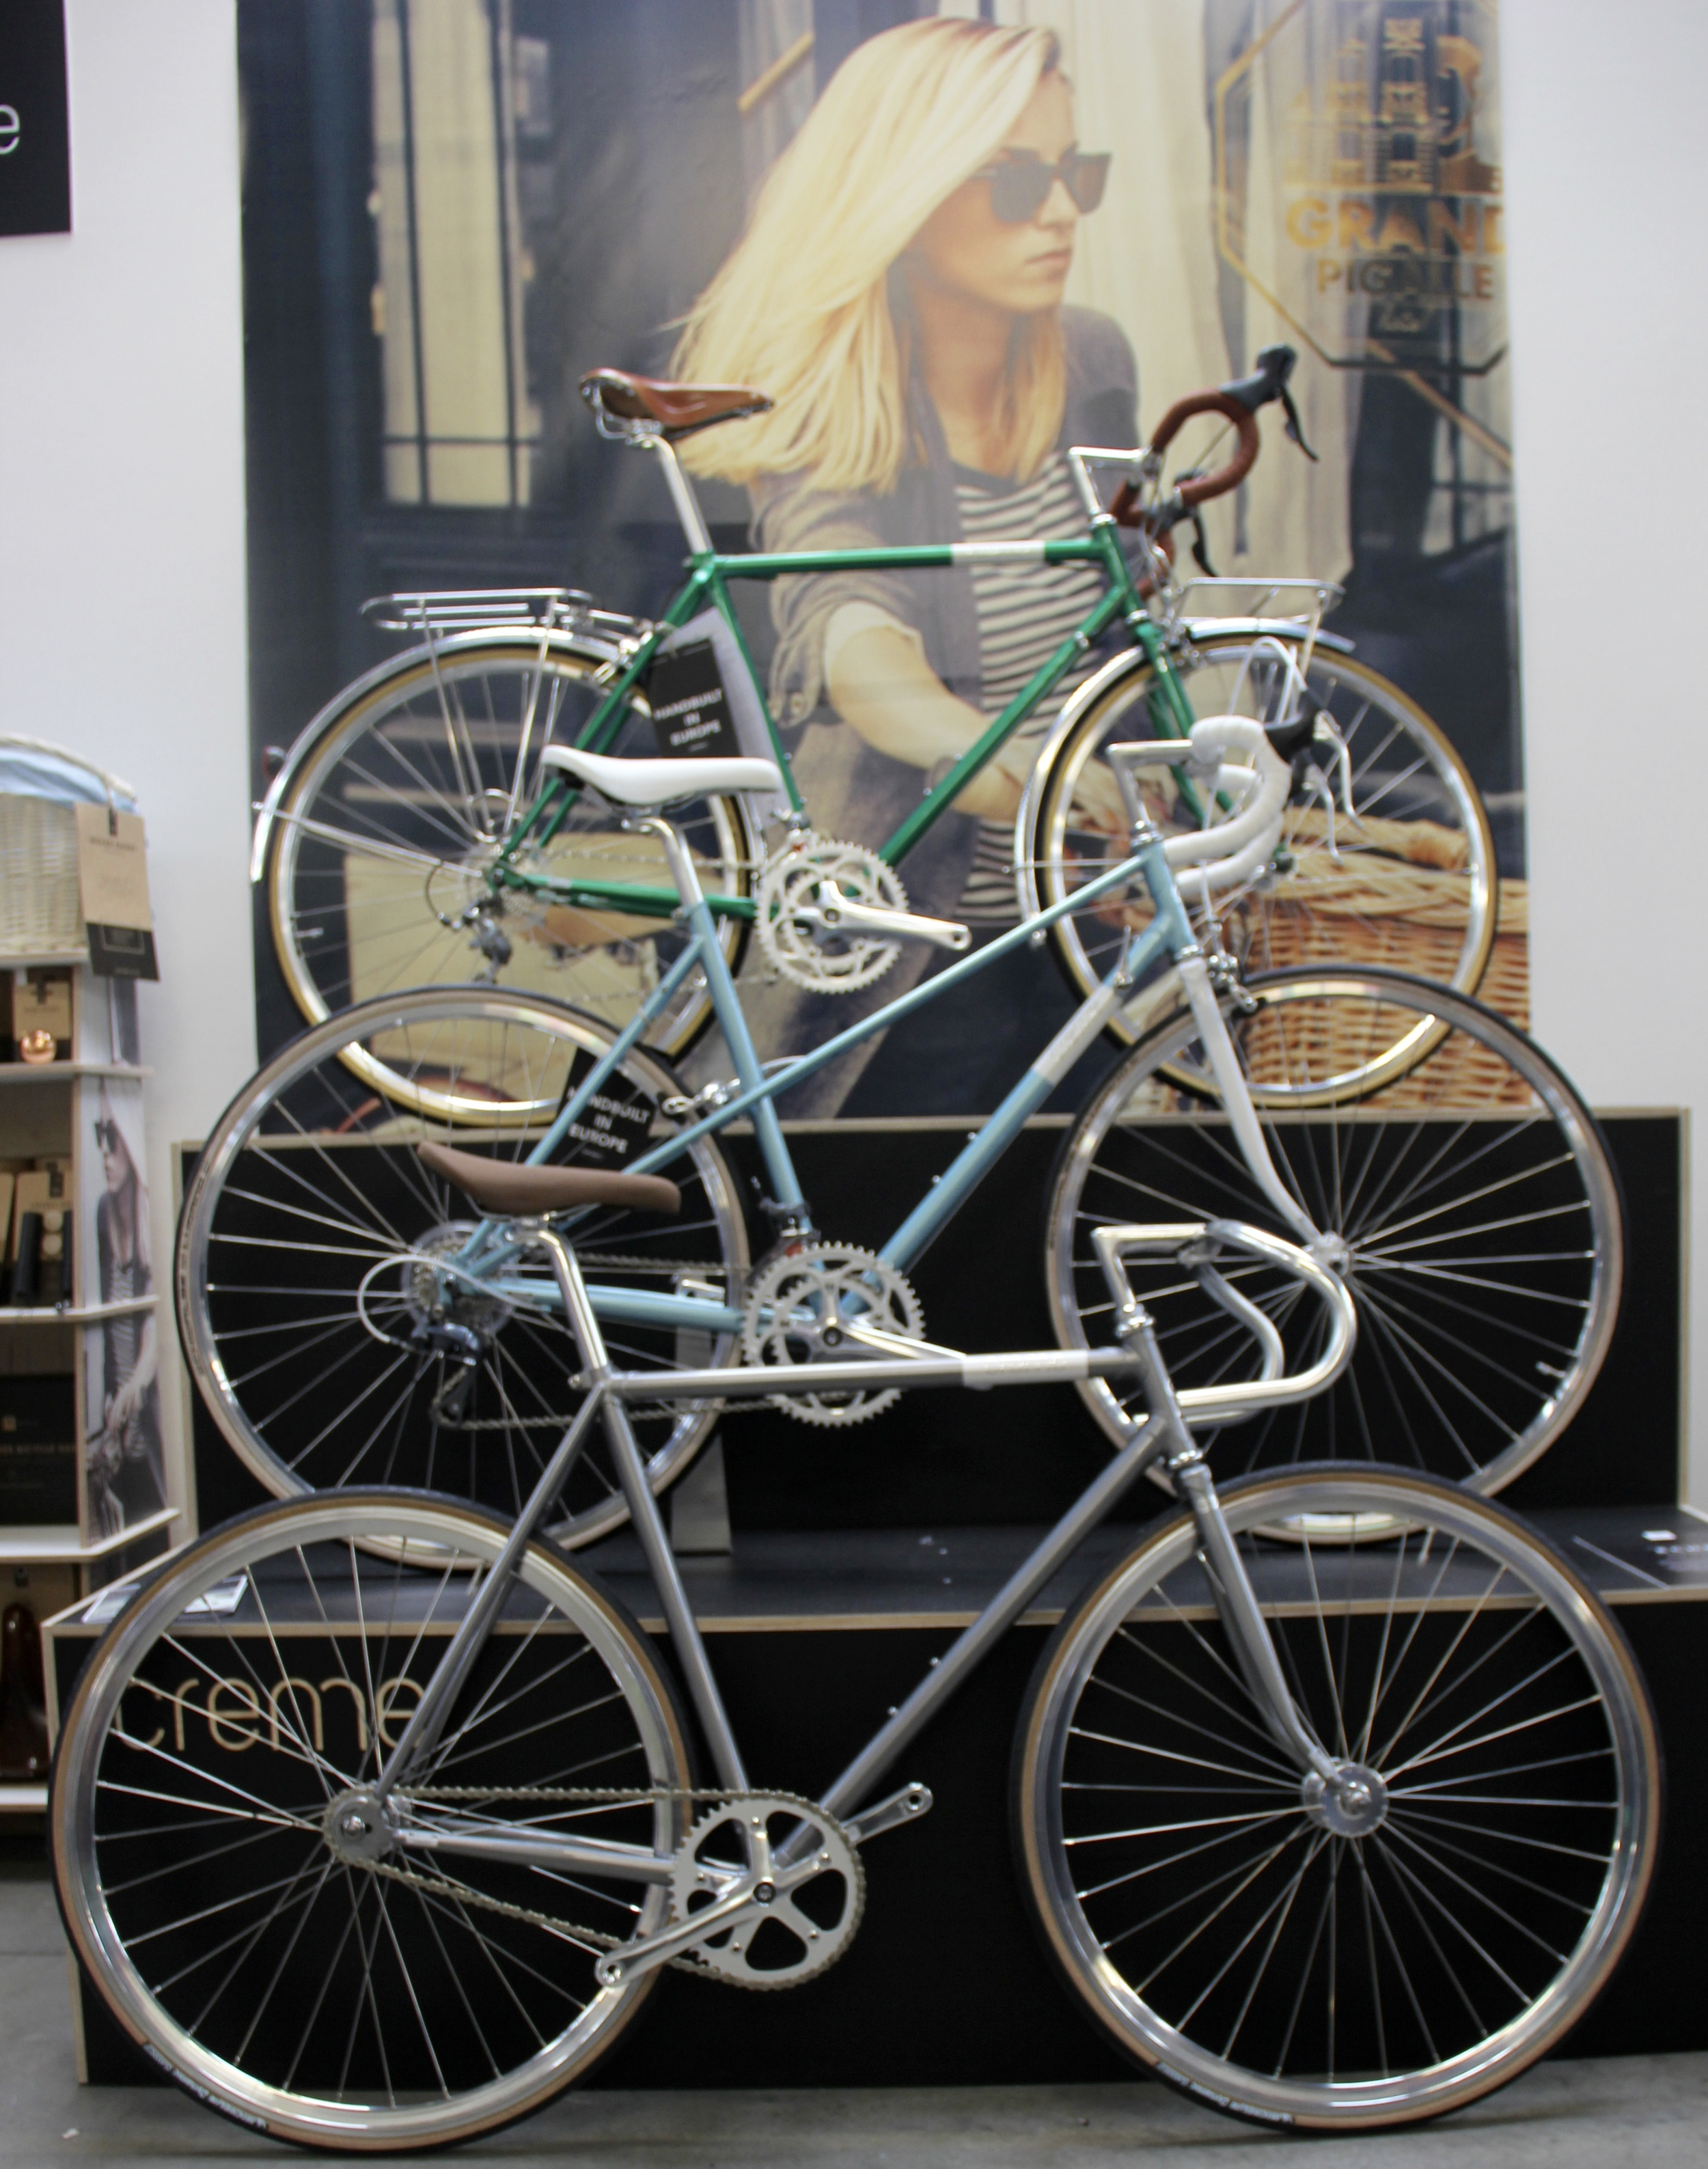 Polish cycle manufacture Creme